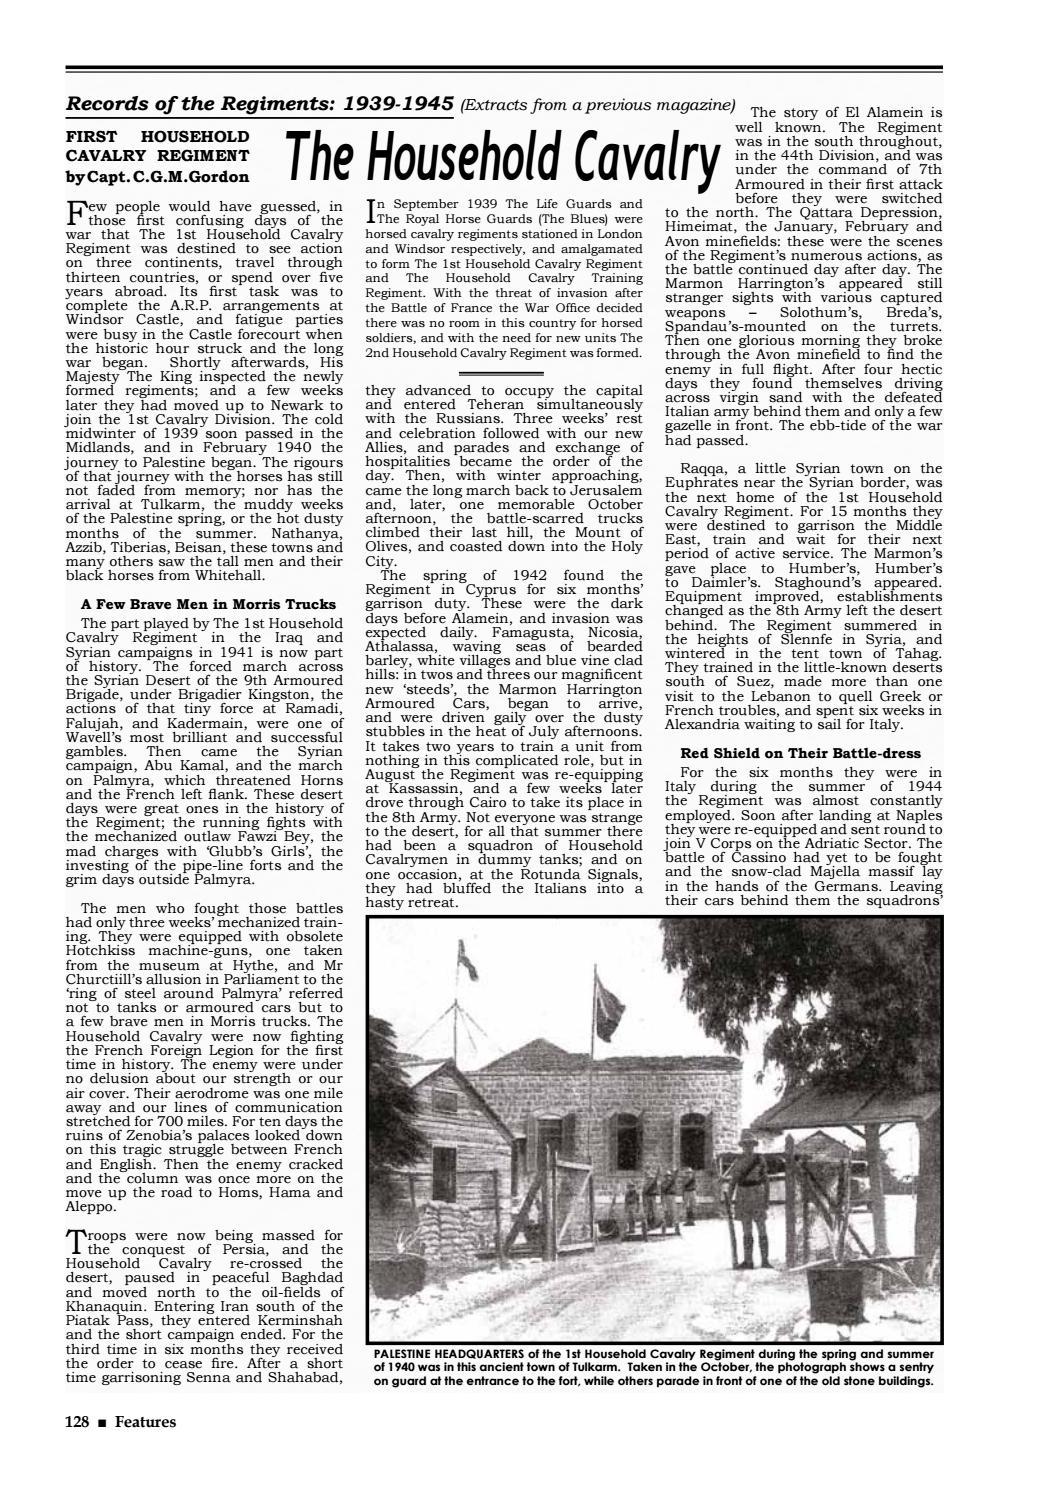 Household Cavalry Journal 2009/10 by RHG/D Reg Sec - issuu